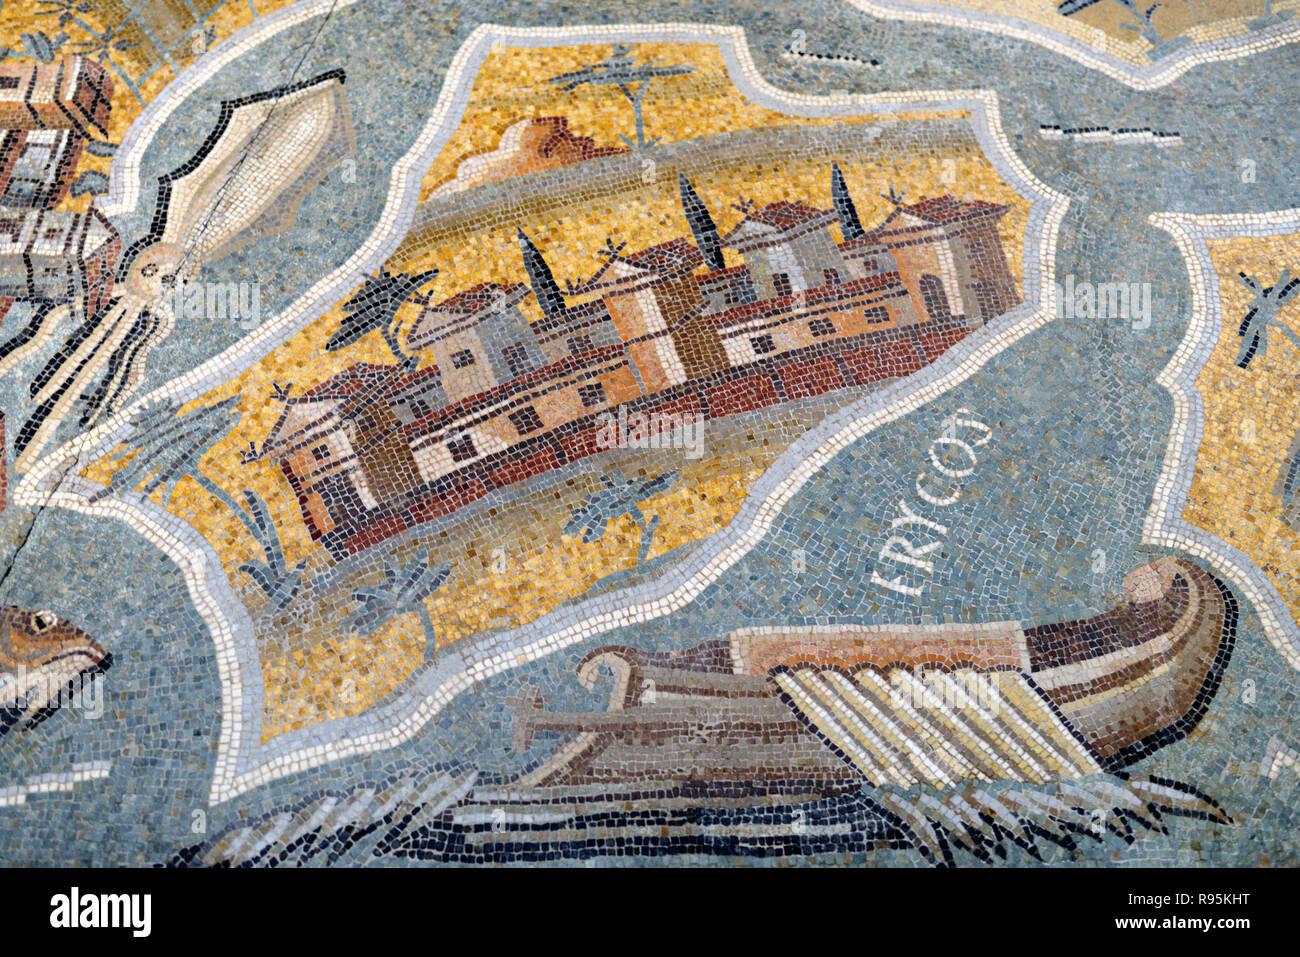 Roman Floor Mosaic (c3rd-c4th) of Erice & Mount Erice, anc Erycos & Mount Eryx, Sicily, from Ancient Roman City of Ammaedara Haidra Tunisia - Stock Image